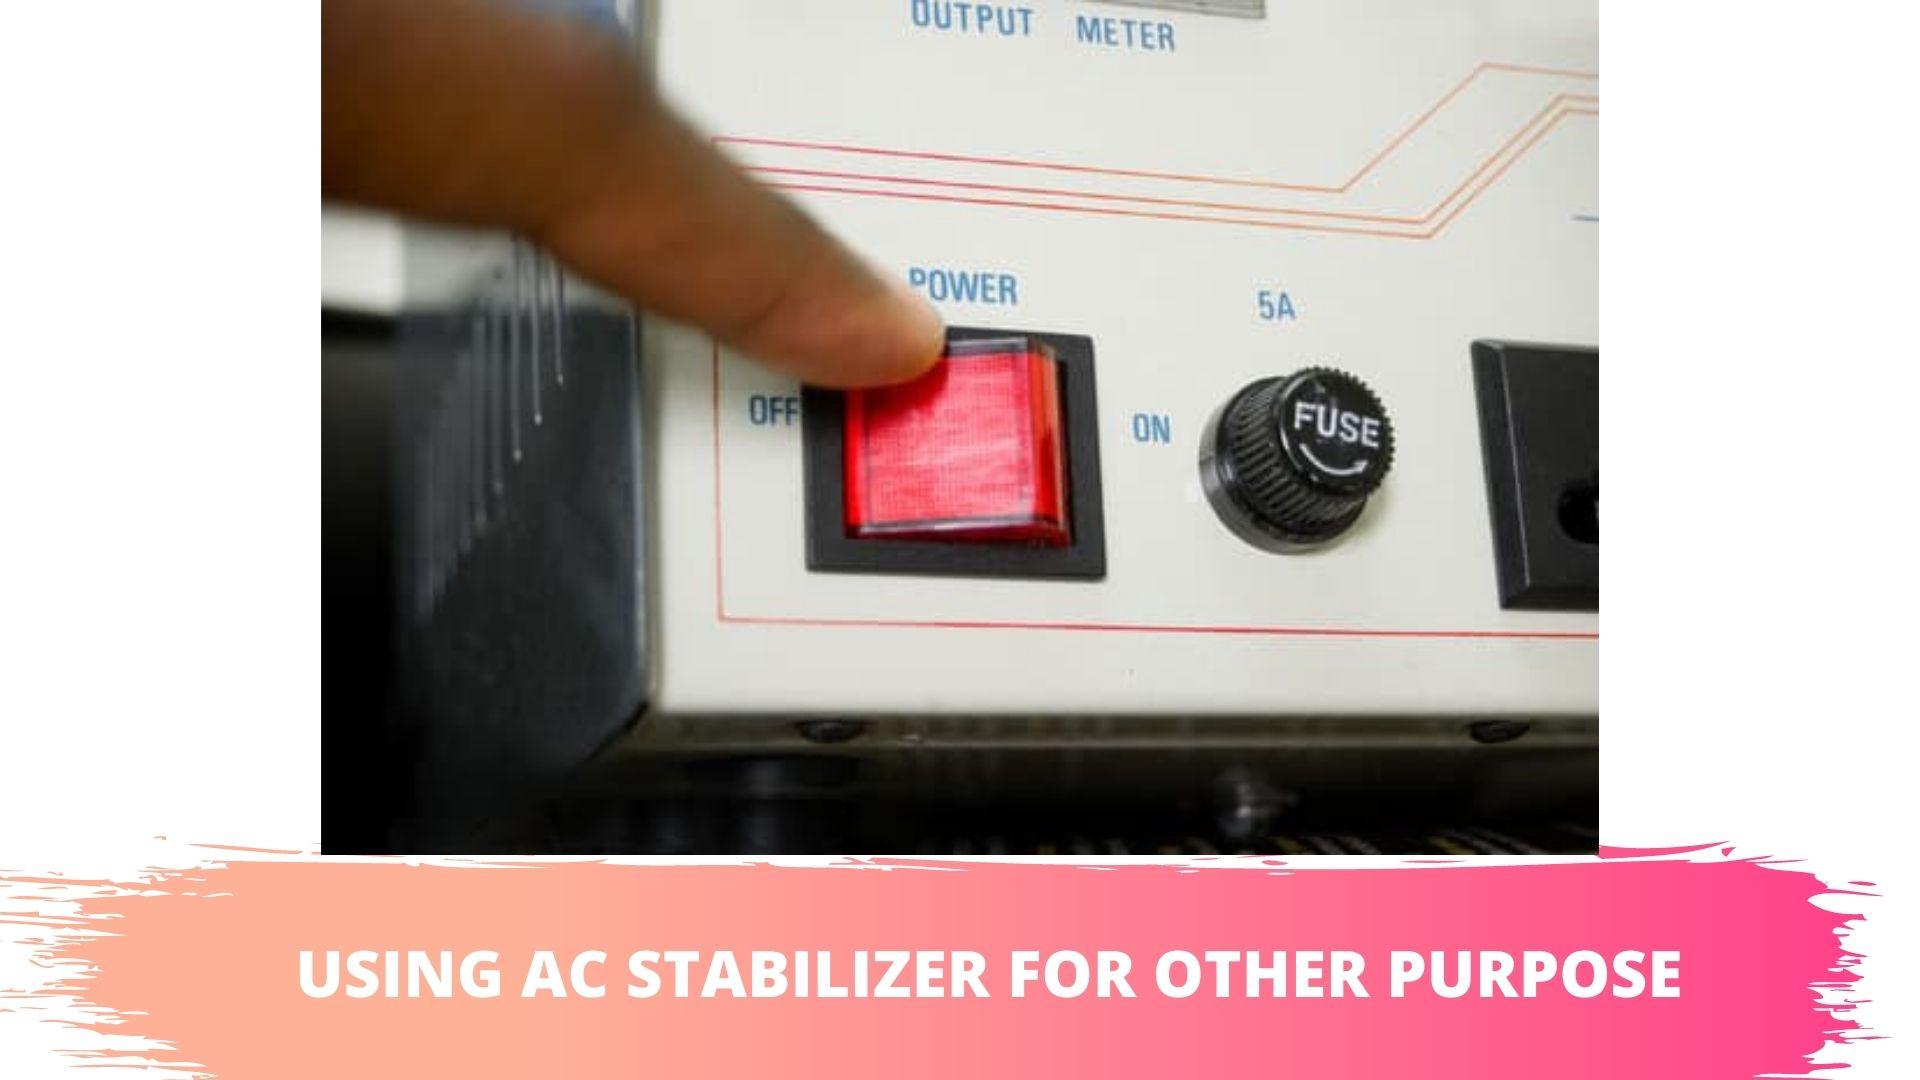 ac stabilizer for washing machine,fridge,home,main line,tv